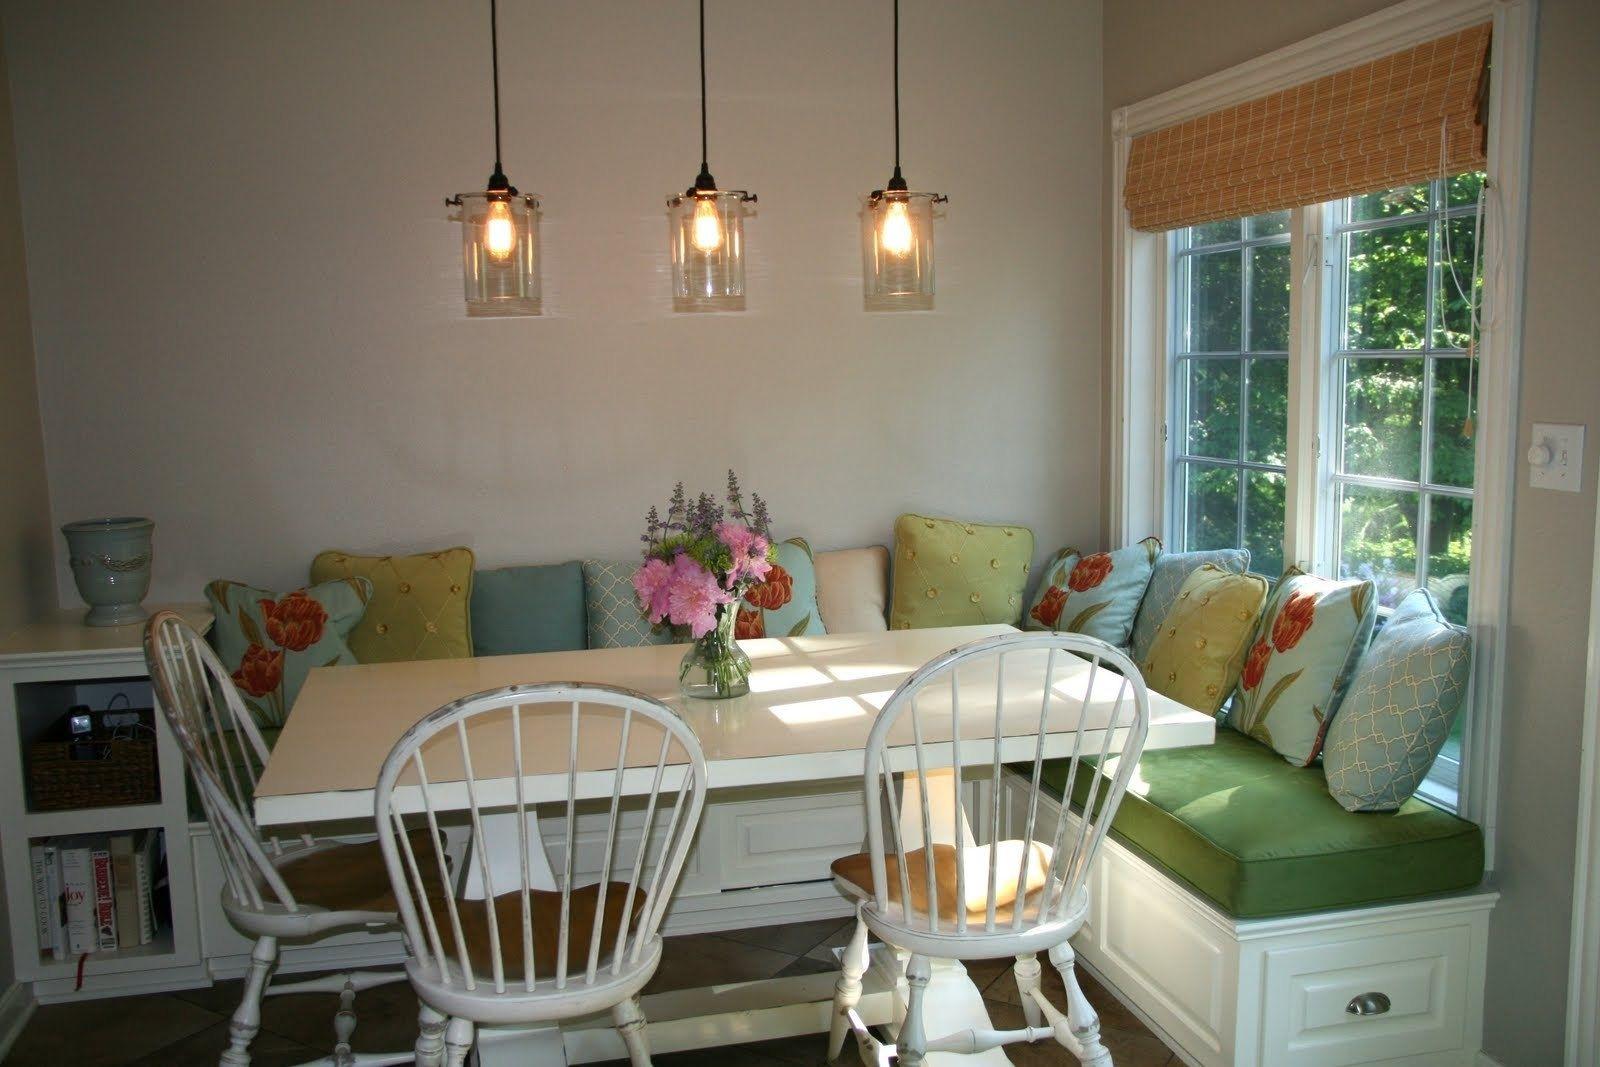 Superb Modern Modern Banquette Dining Set Corner Bench One Dailytribune Chair Design For Home Dailytribuneorg